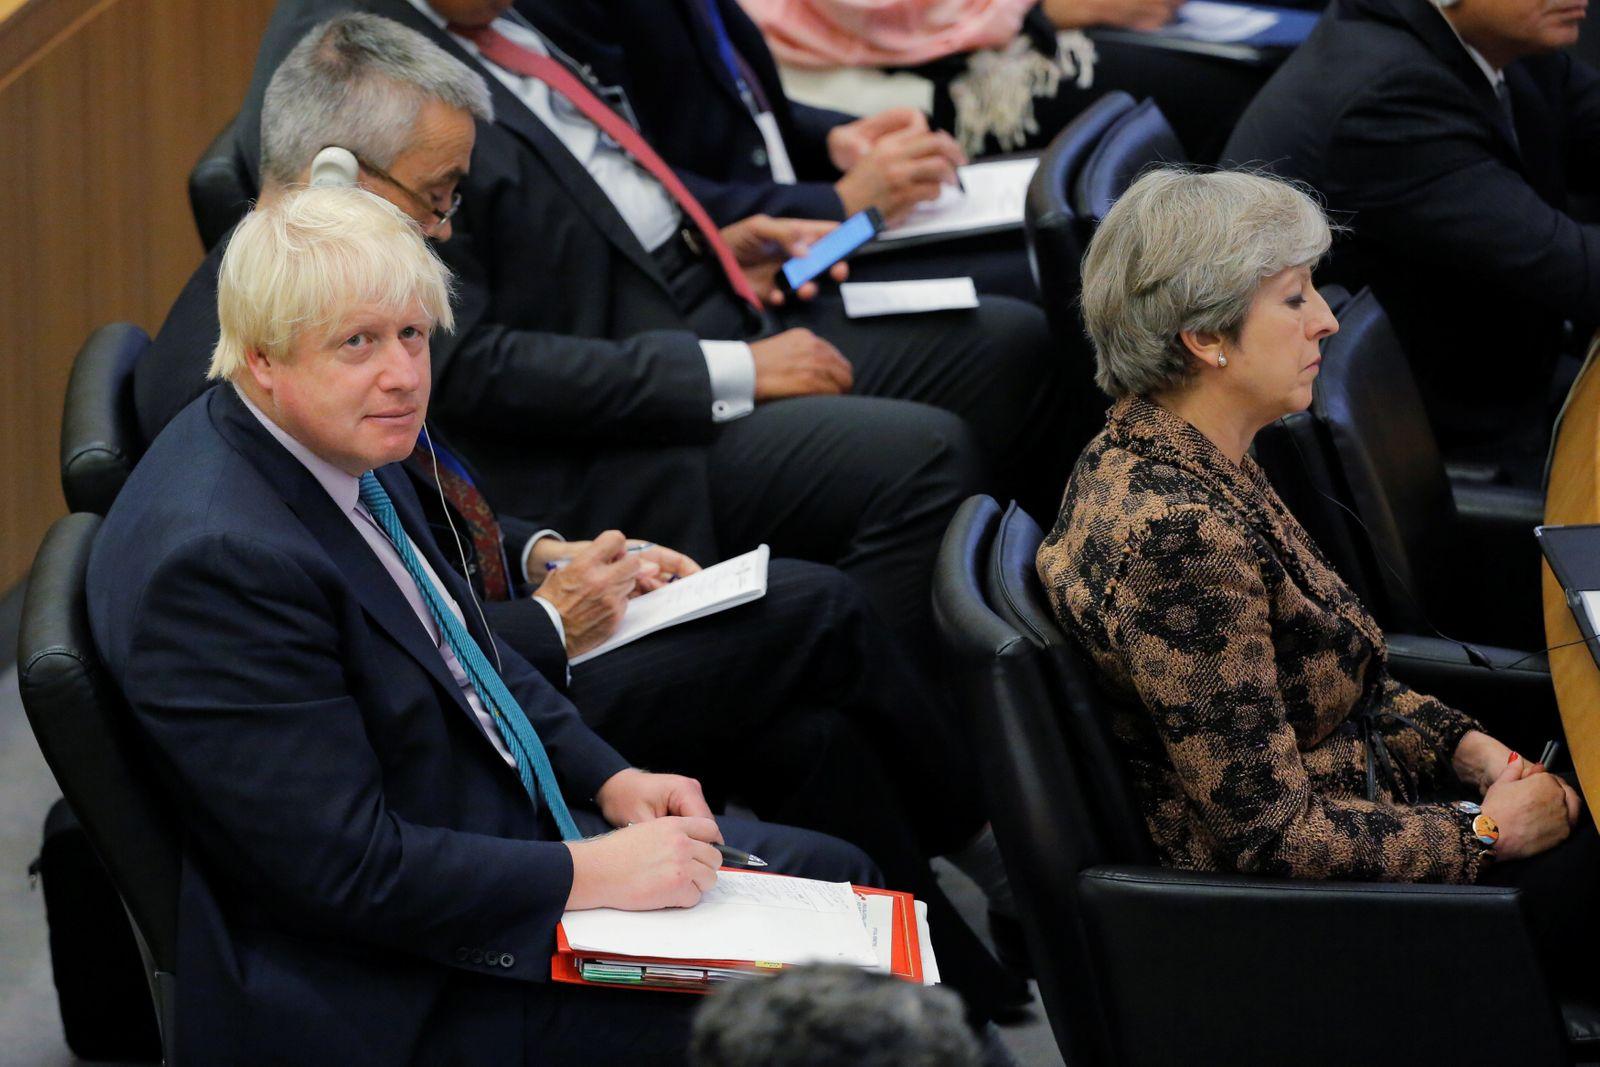 Theresa May / Boris Johnson